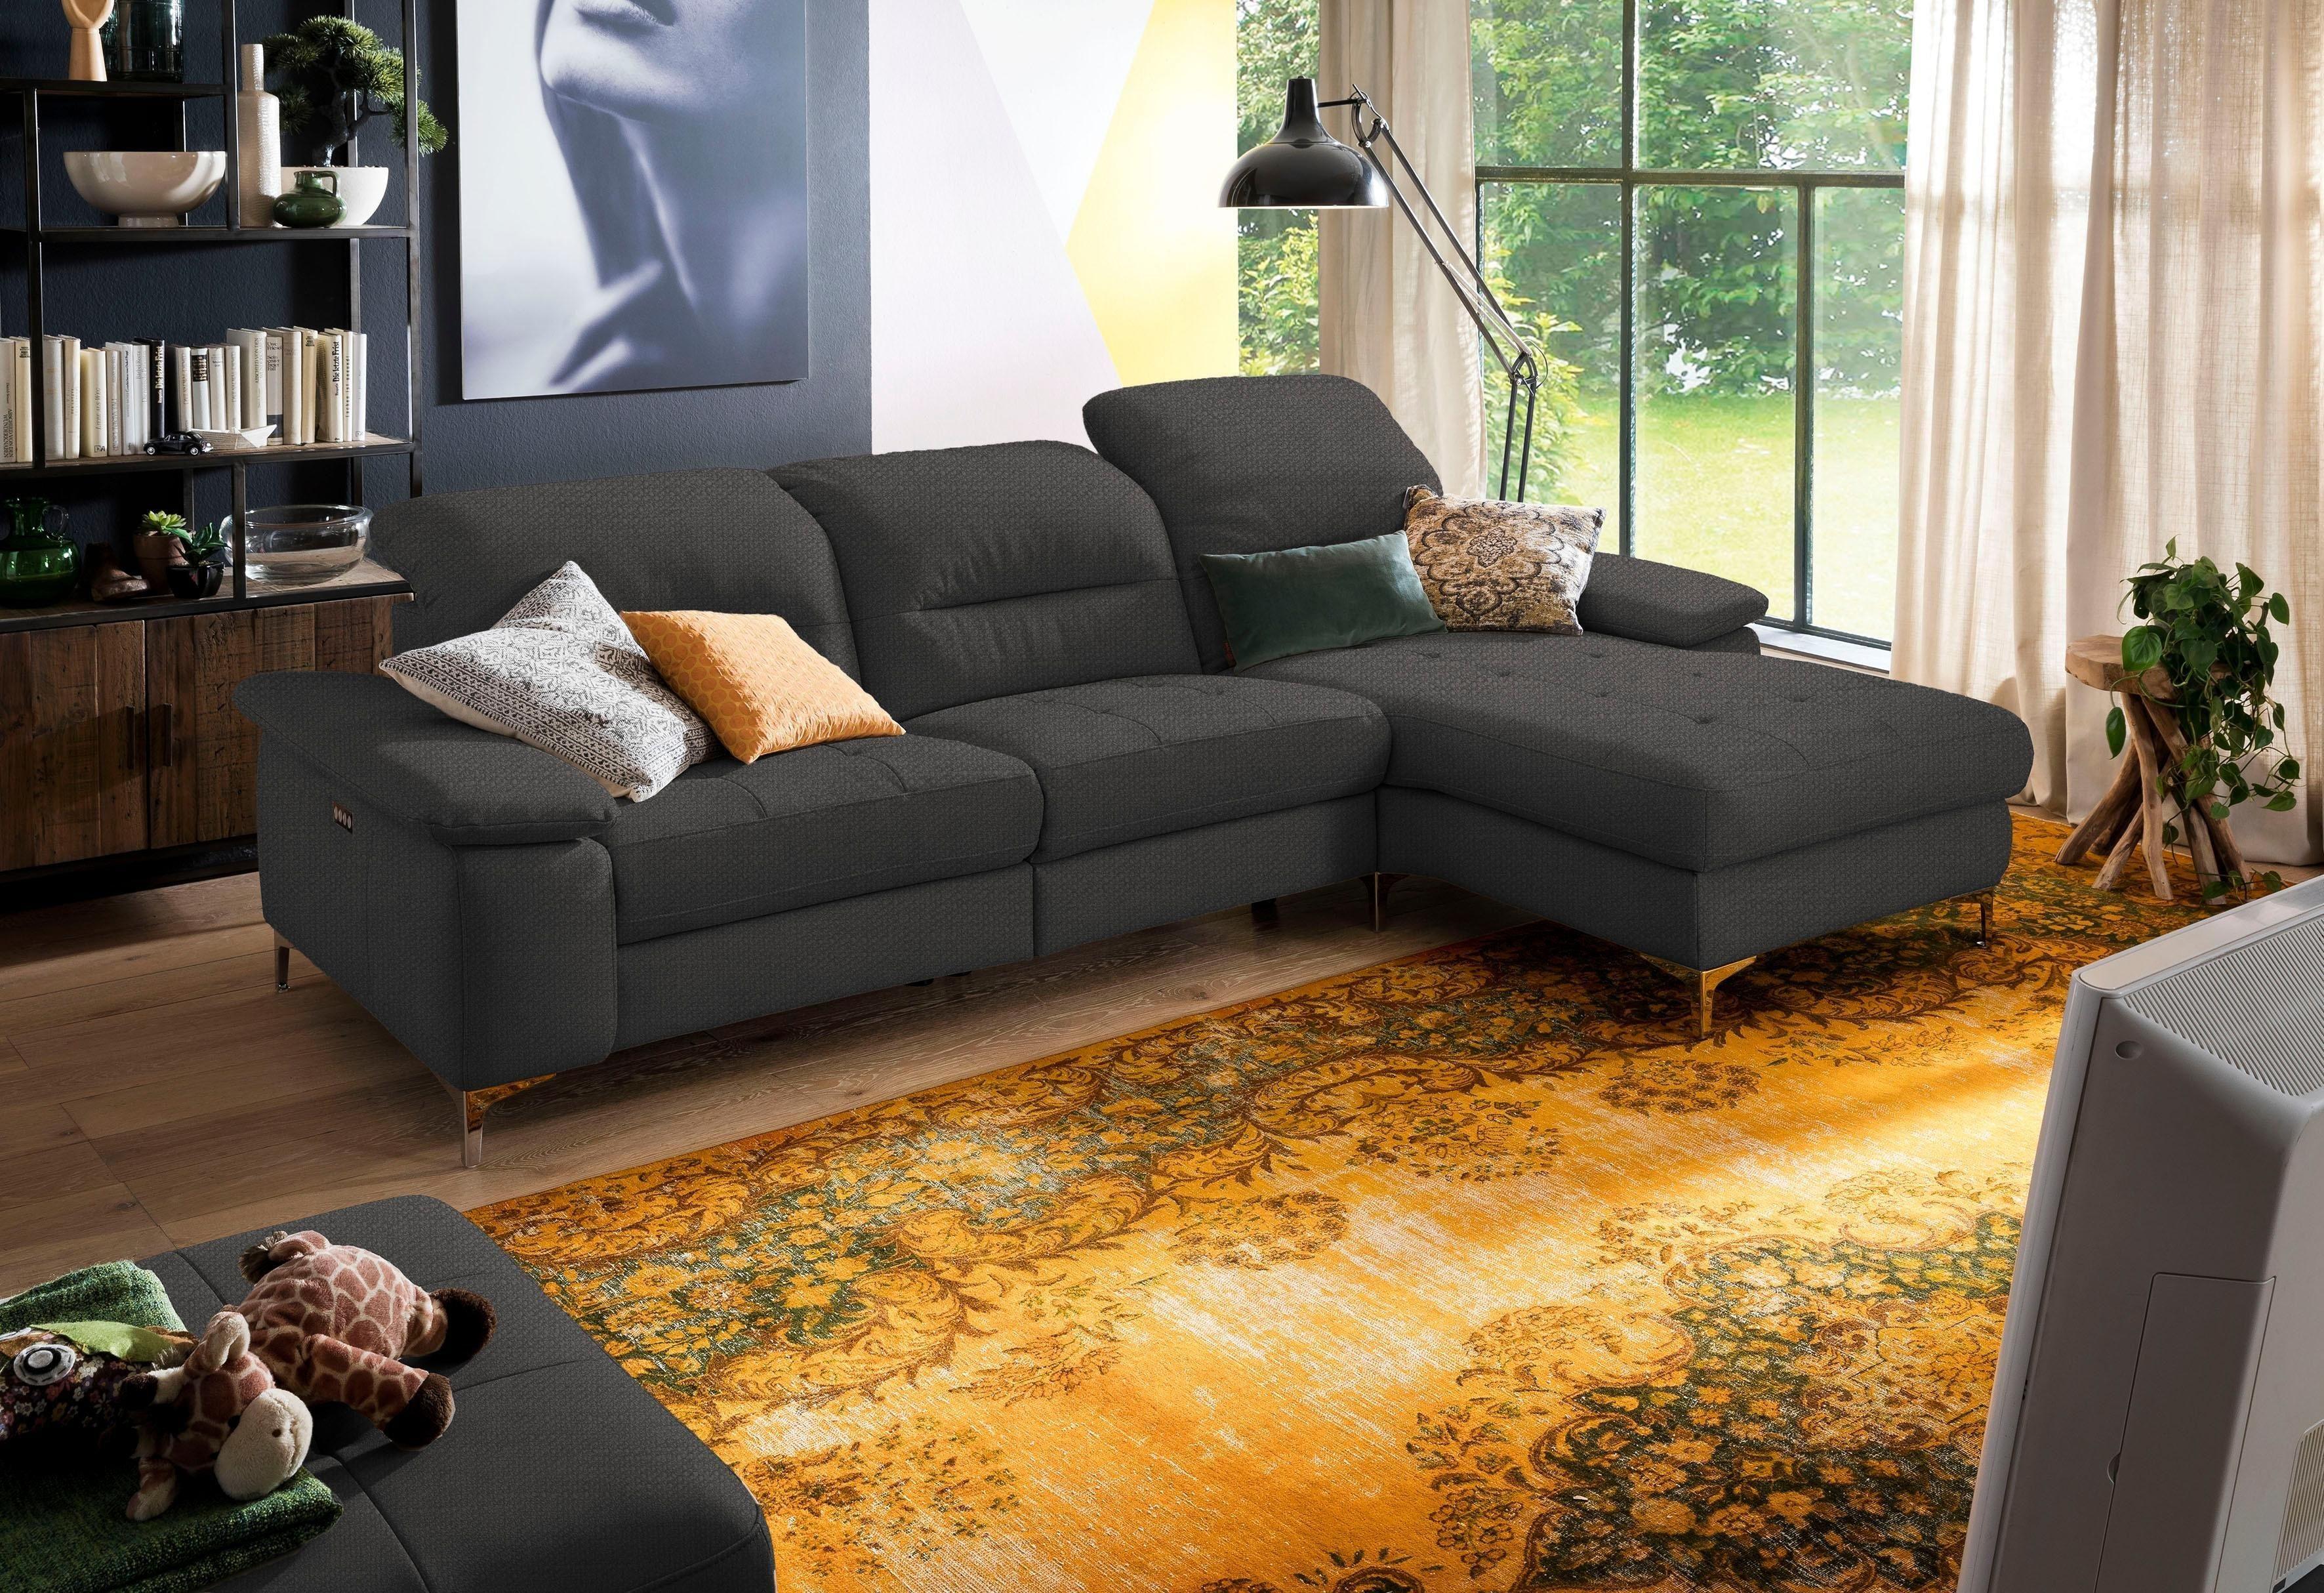 Gunstige Sofas Mit Bettfunktion Ecksofa Angebot Sofa Billigt